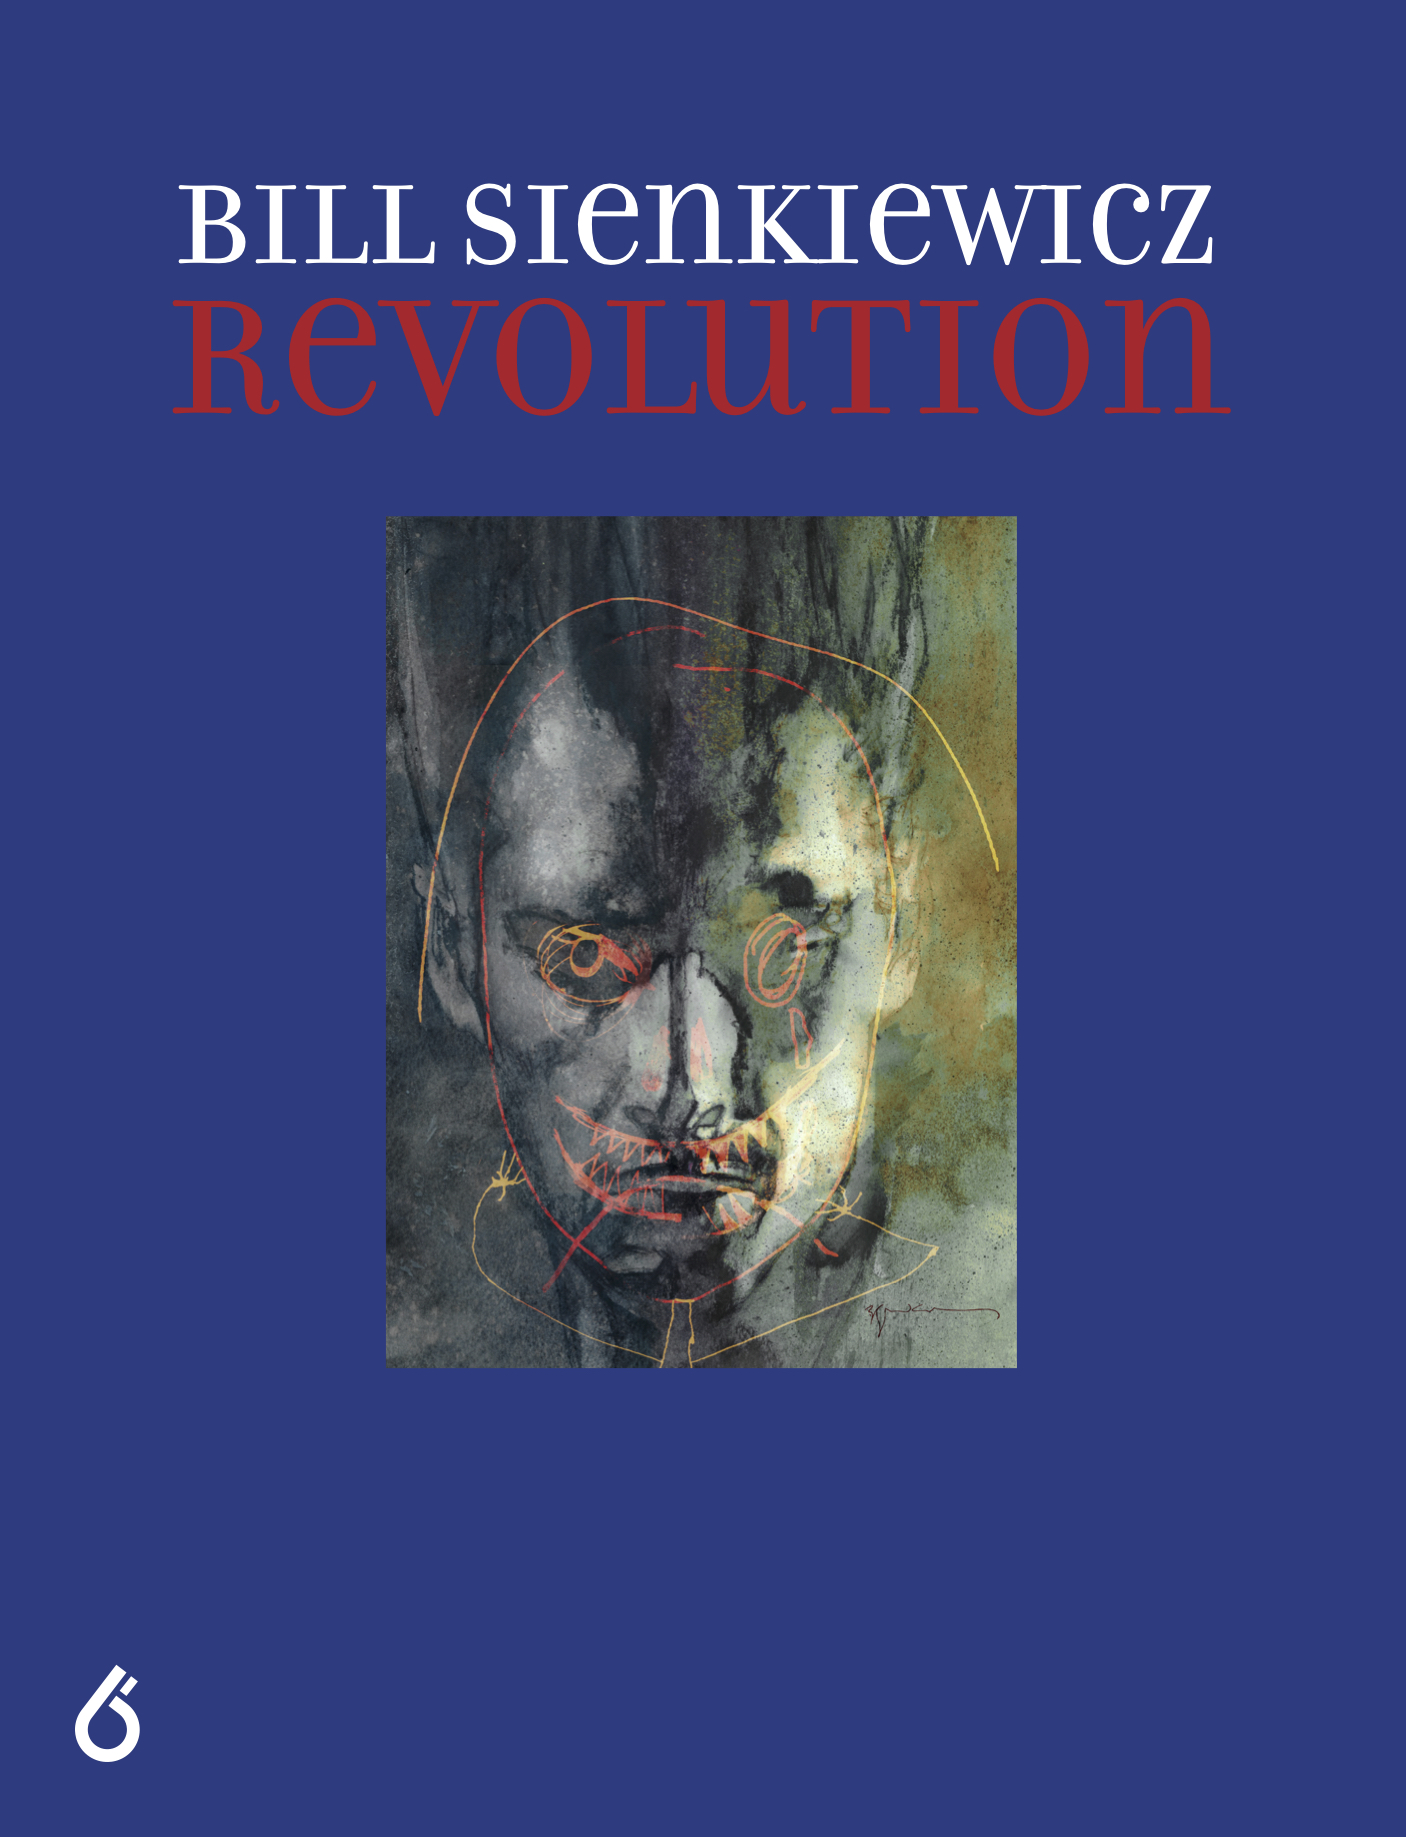 Bill Sienkiewicz: Revolution, Vol. I Trade Edition Cover